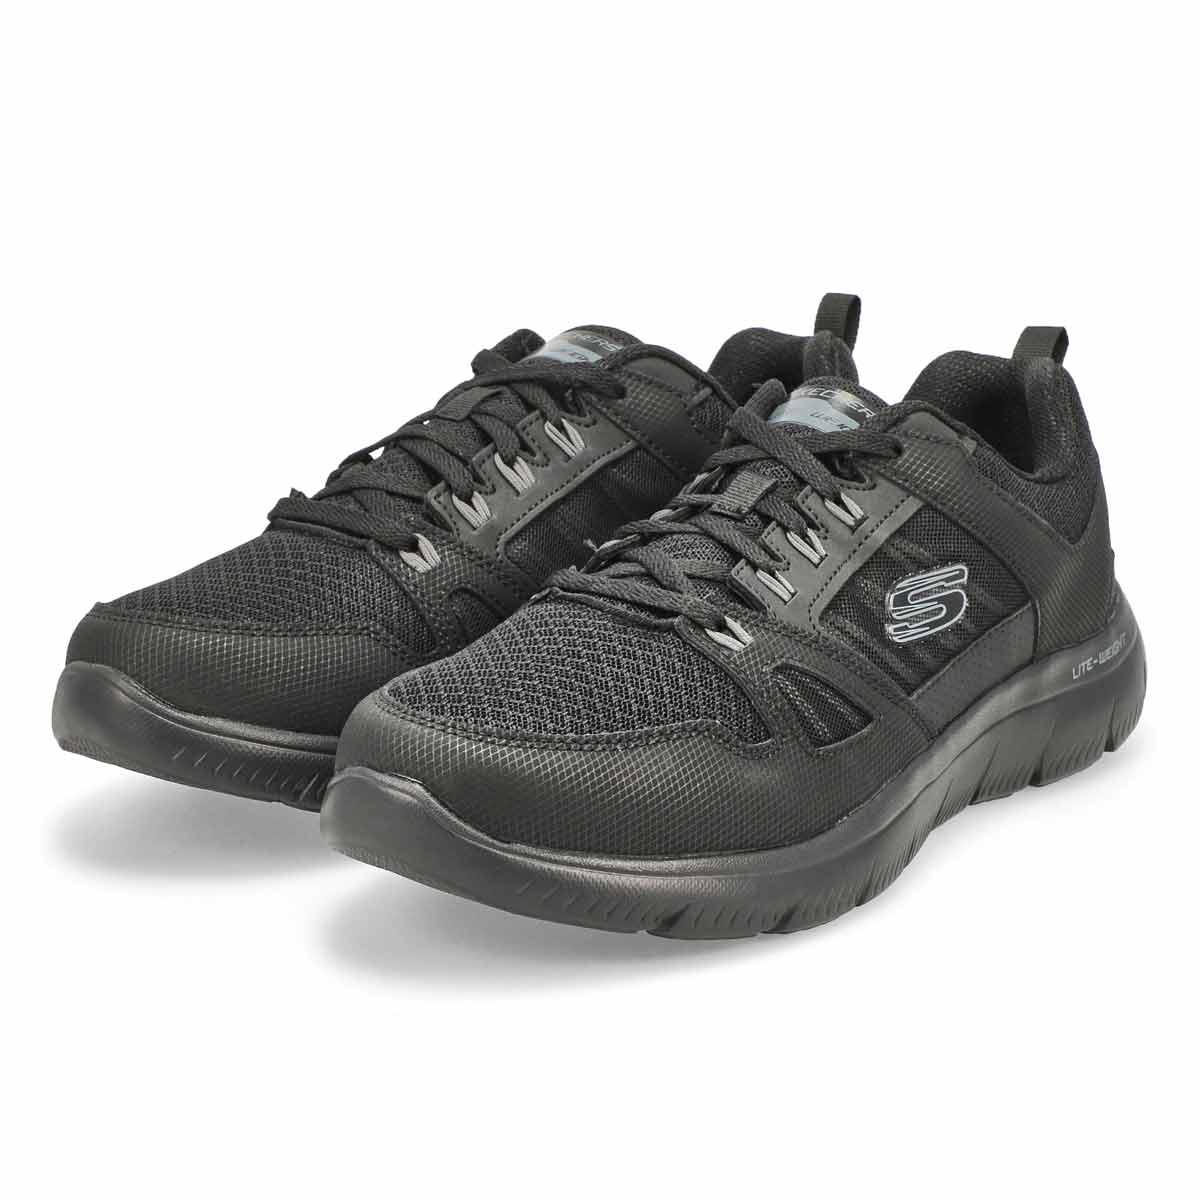 Men's Summits New World Sneakers -Wide -black